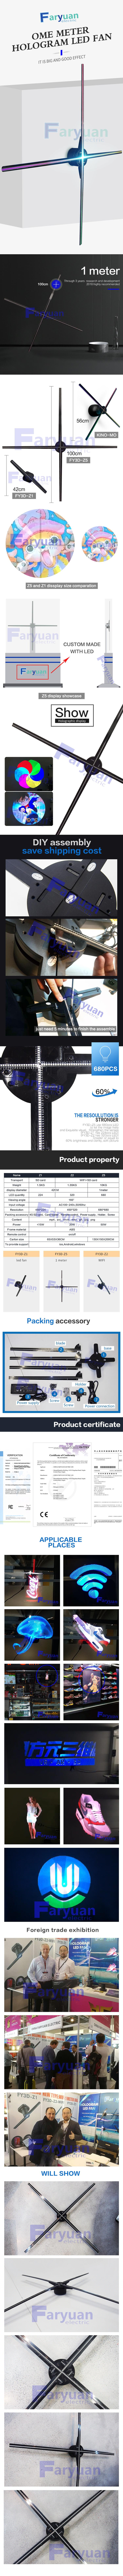 FY3D-Z5: 100cm hologram LED fan 1meter Hologram Adverstising Display  Hypervsn Kino-mo